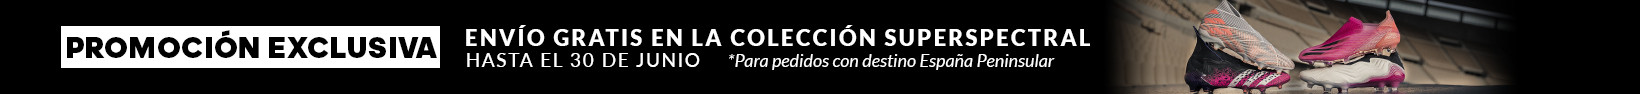 adidas_superspextral_envios_barrita_ES.jpg